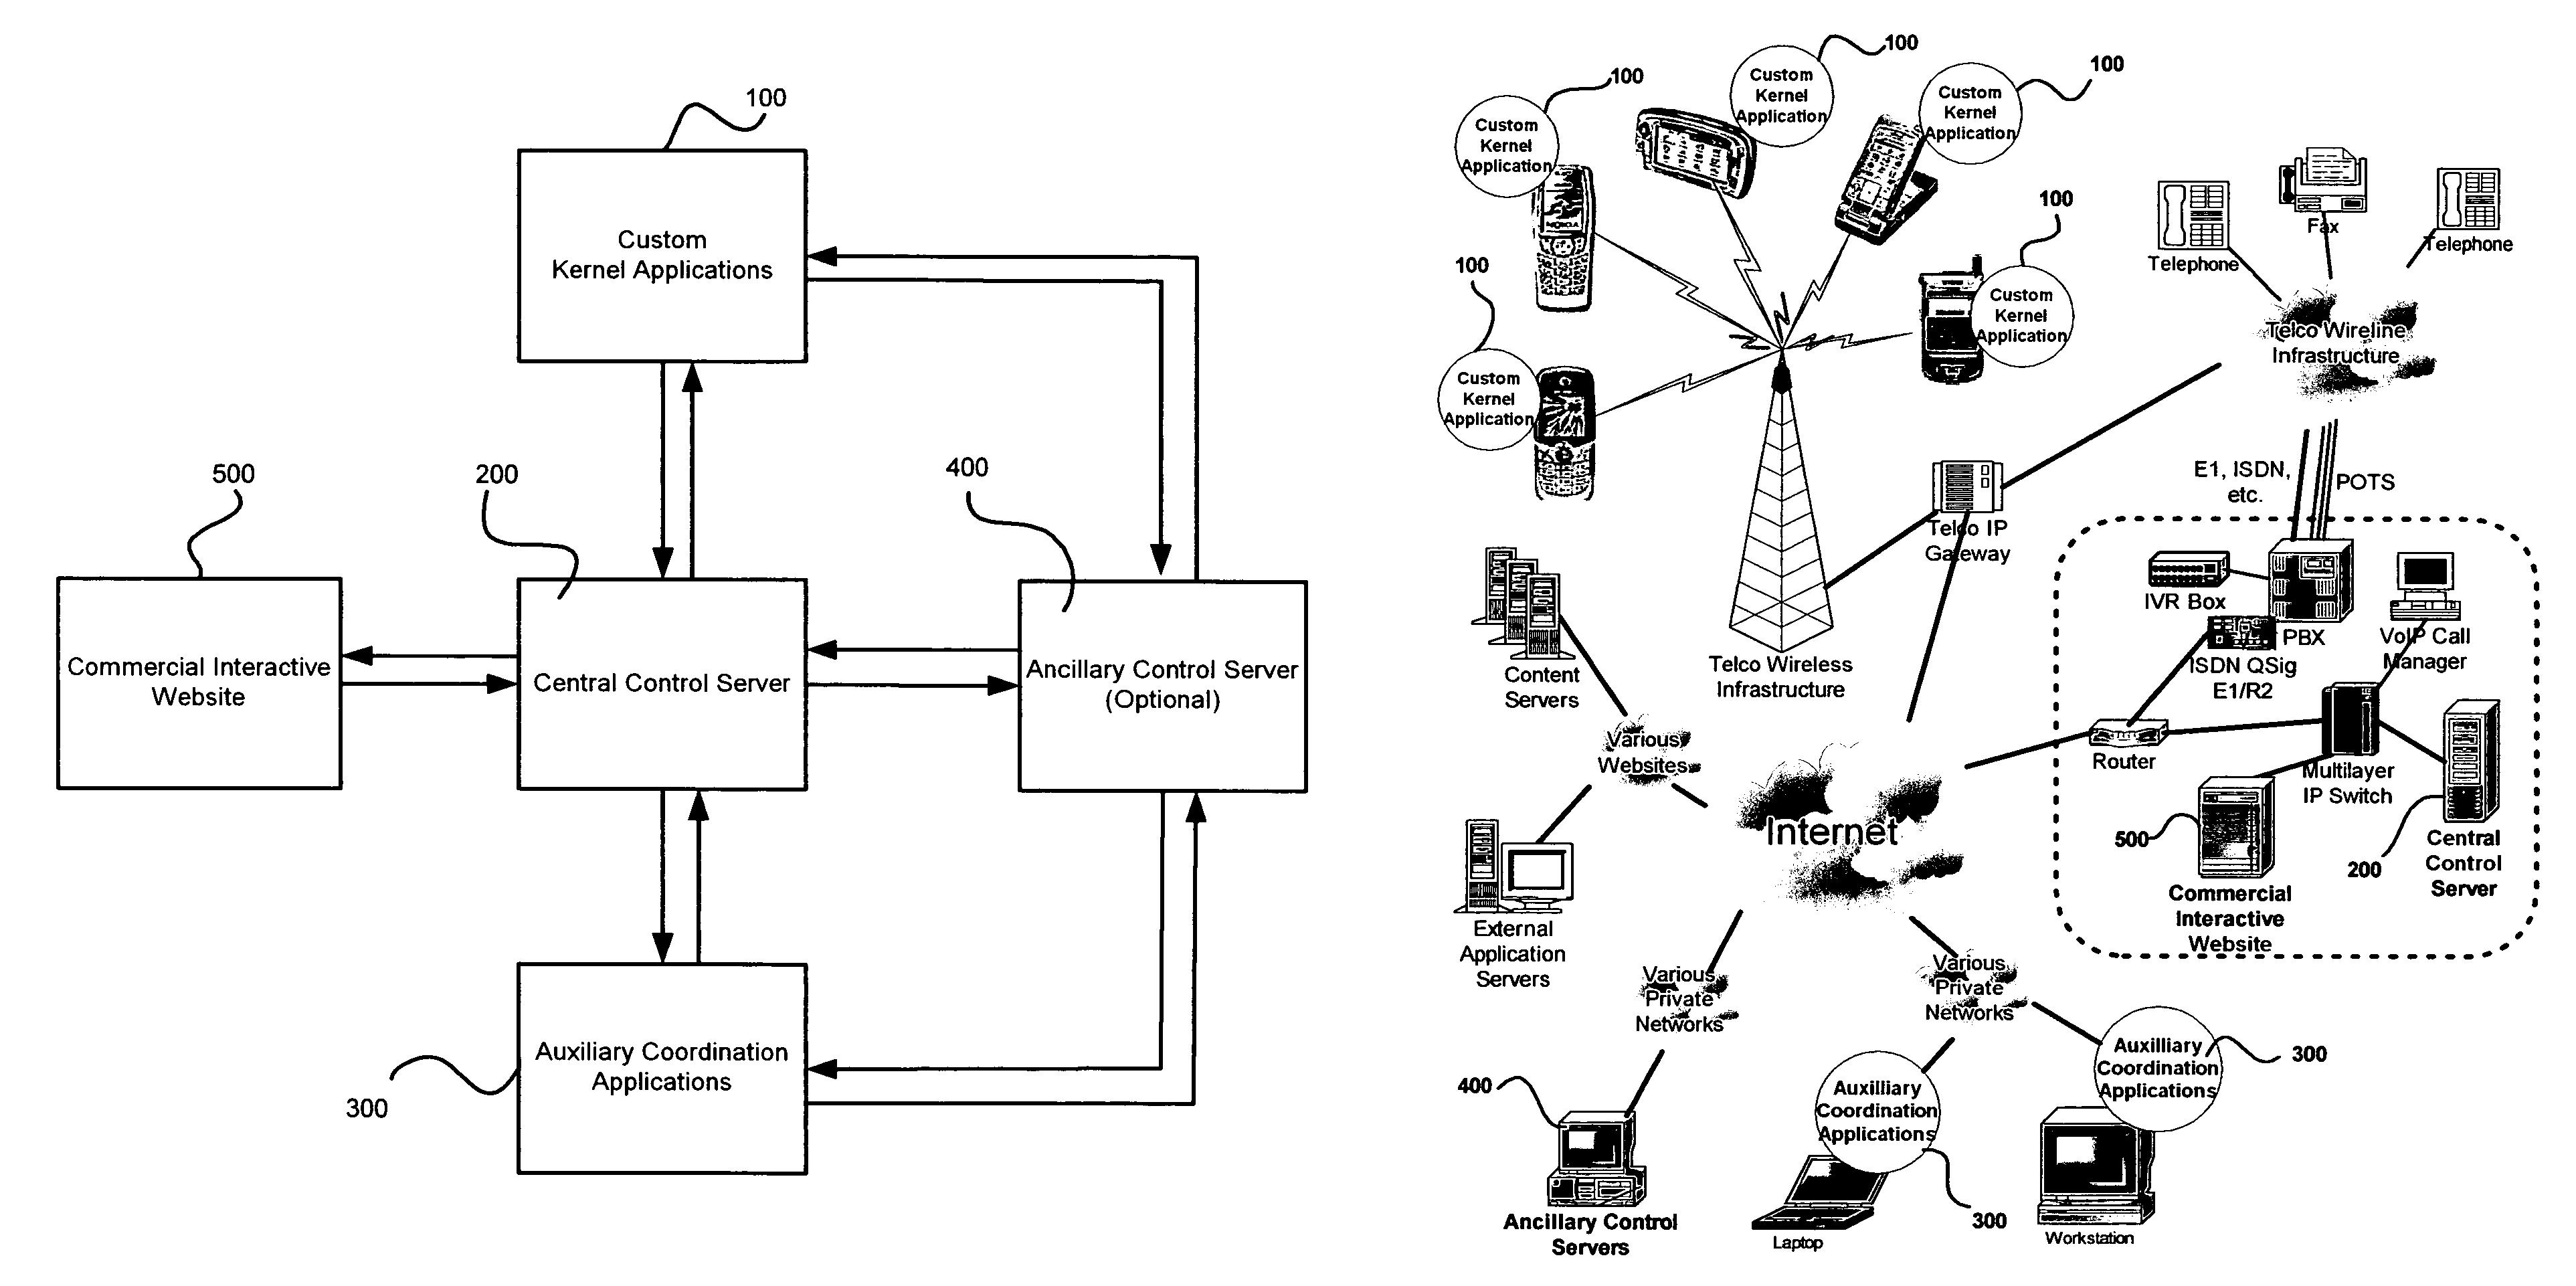 diagram of internet infrastructure